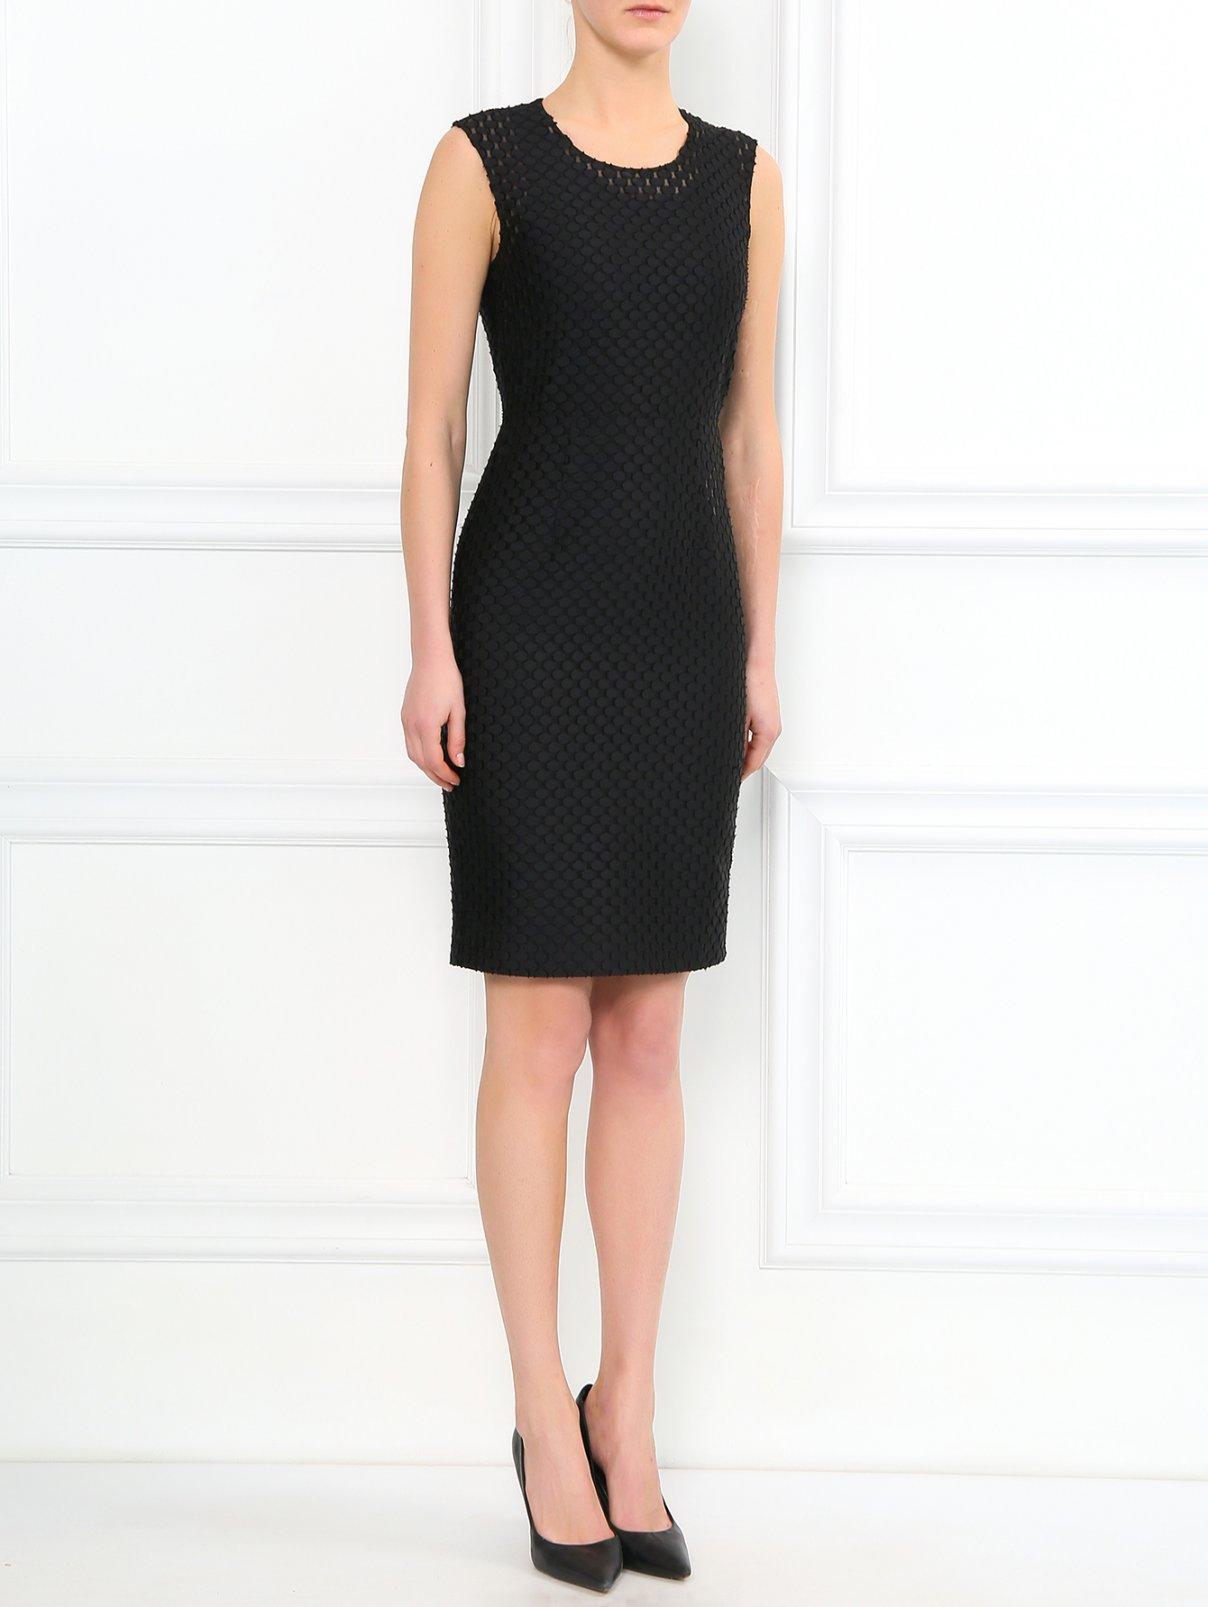 Платье-футляр без рукавов Burberry  –  Модель Общий вид